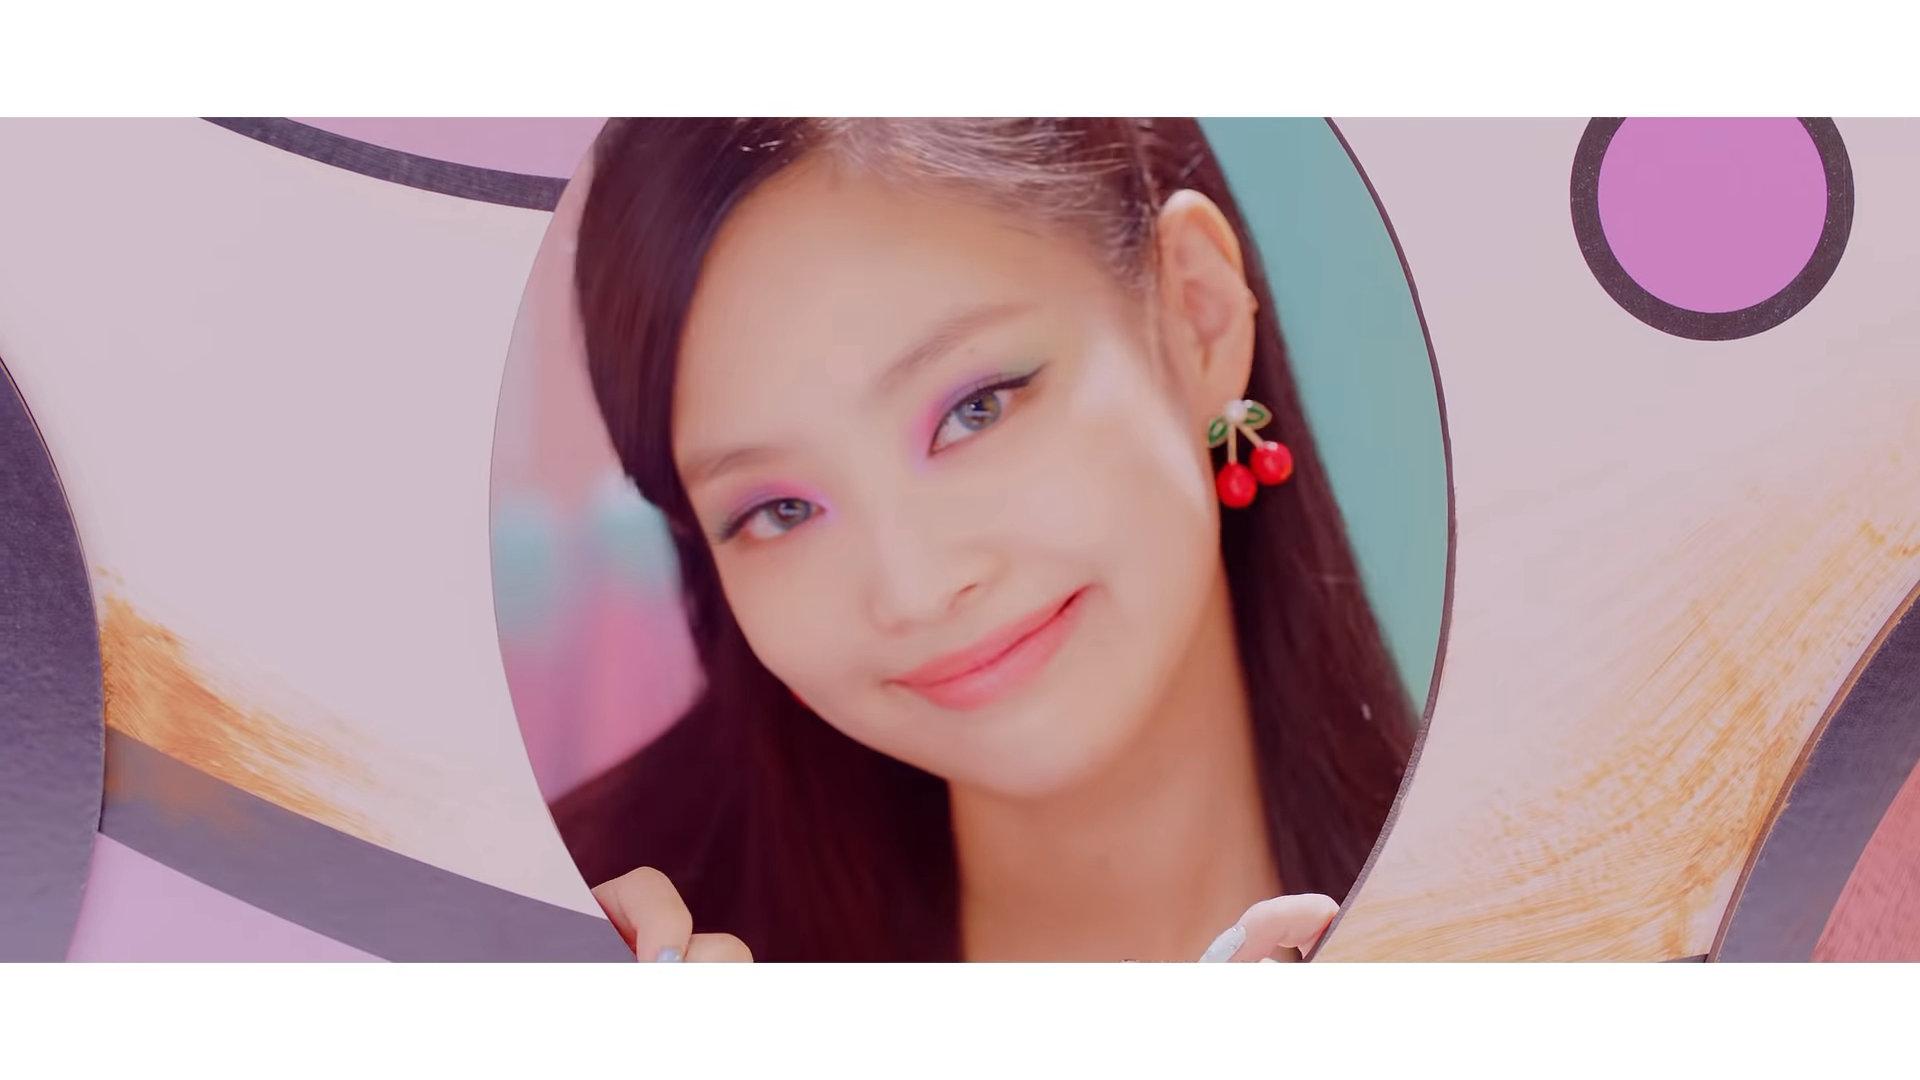 Blackpink Ice Cream Mv Teaser Screencaps Hd Hq K Pop Database Dbkpop Com